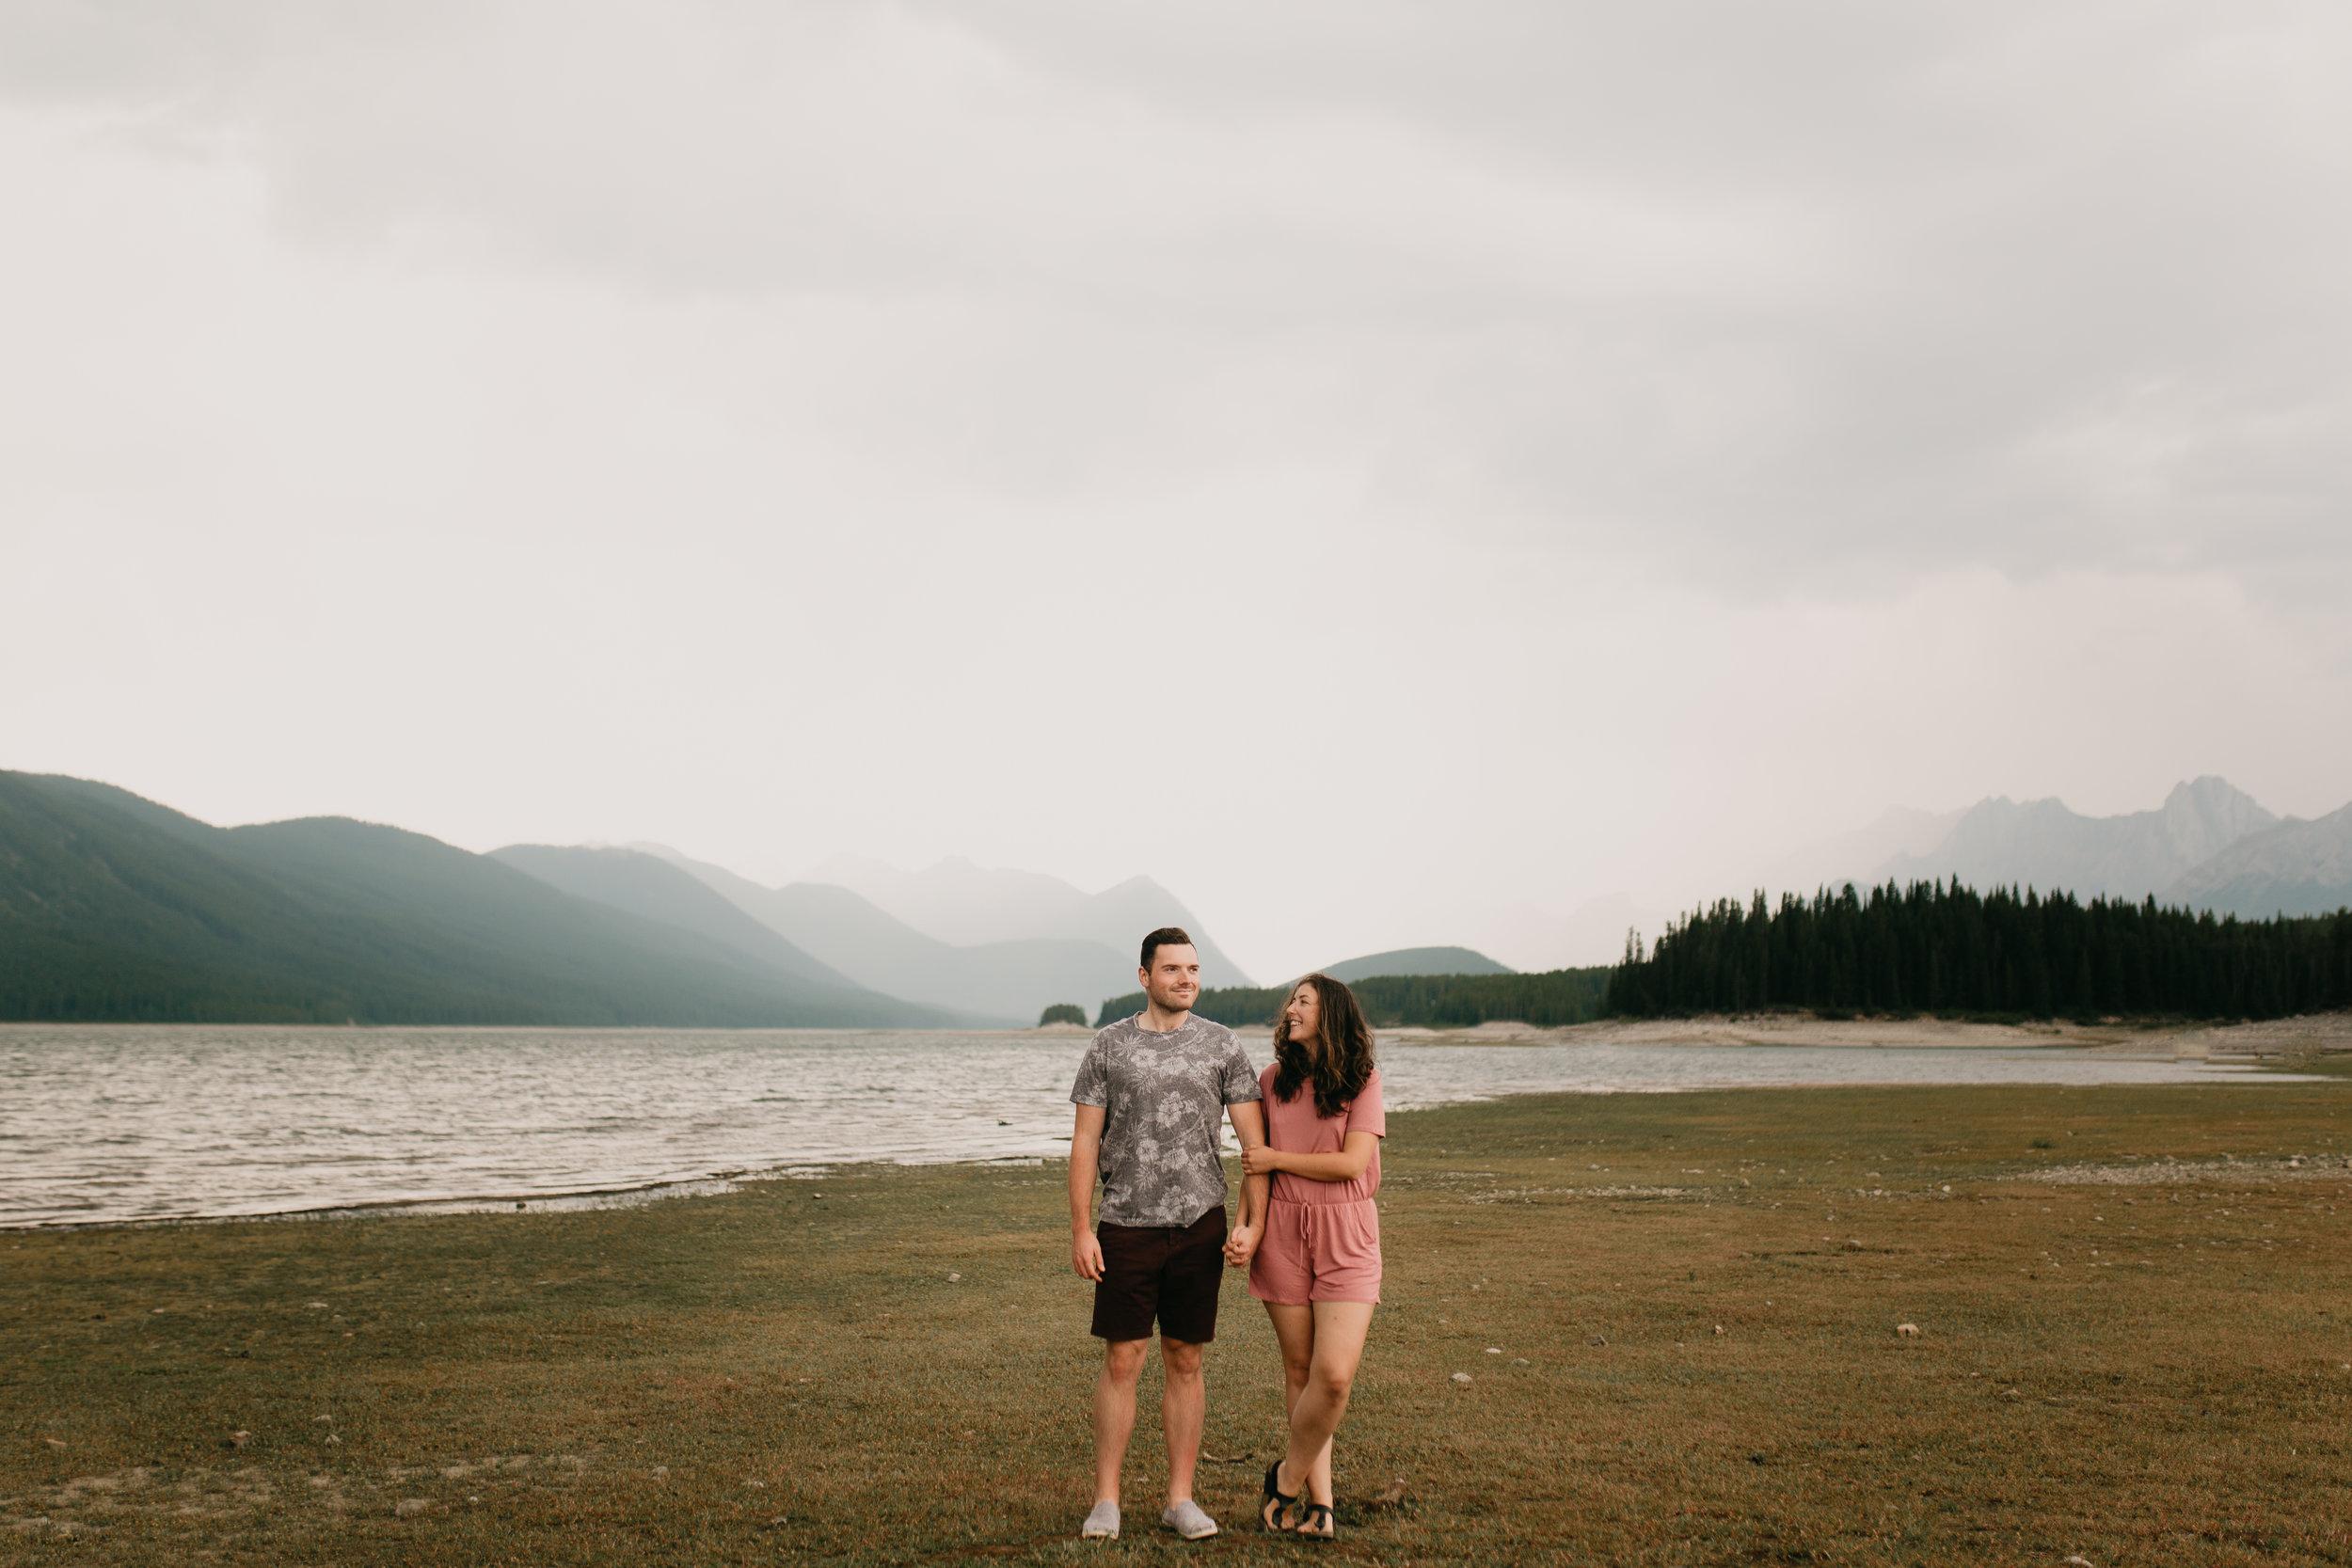 nicole-daacke-banff-kananaskis-alberta-canada-adventure-elopement-photographer-adventure-session-in-the-mountains-photographer-6.jpg